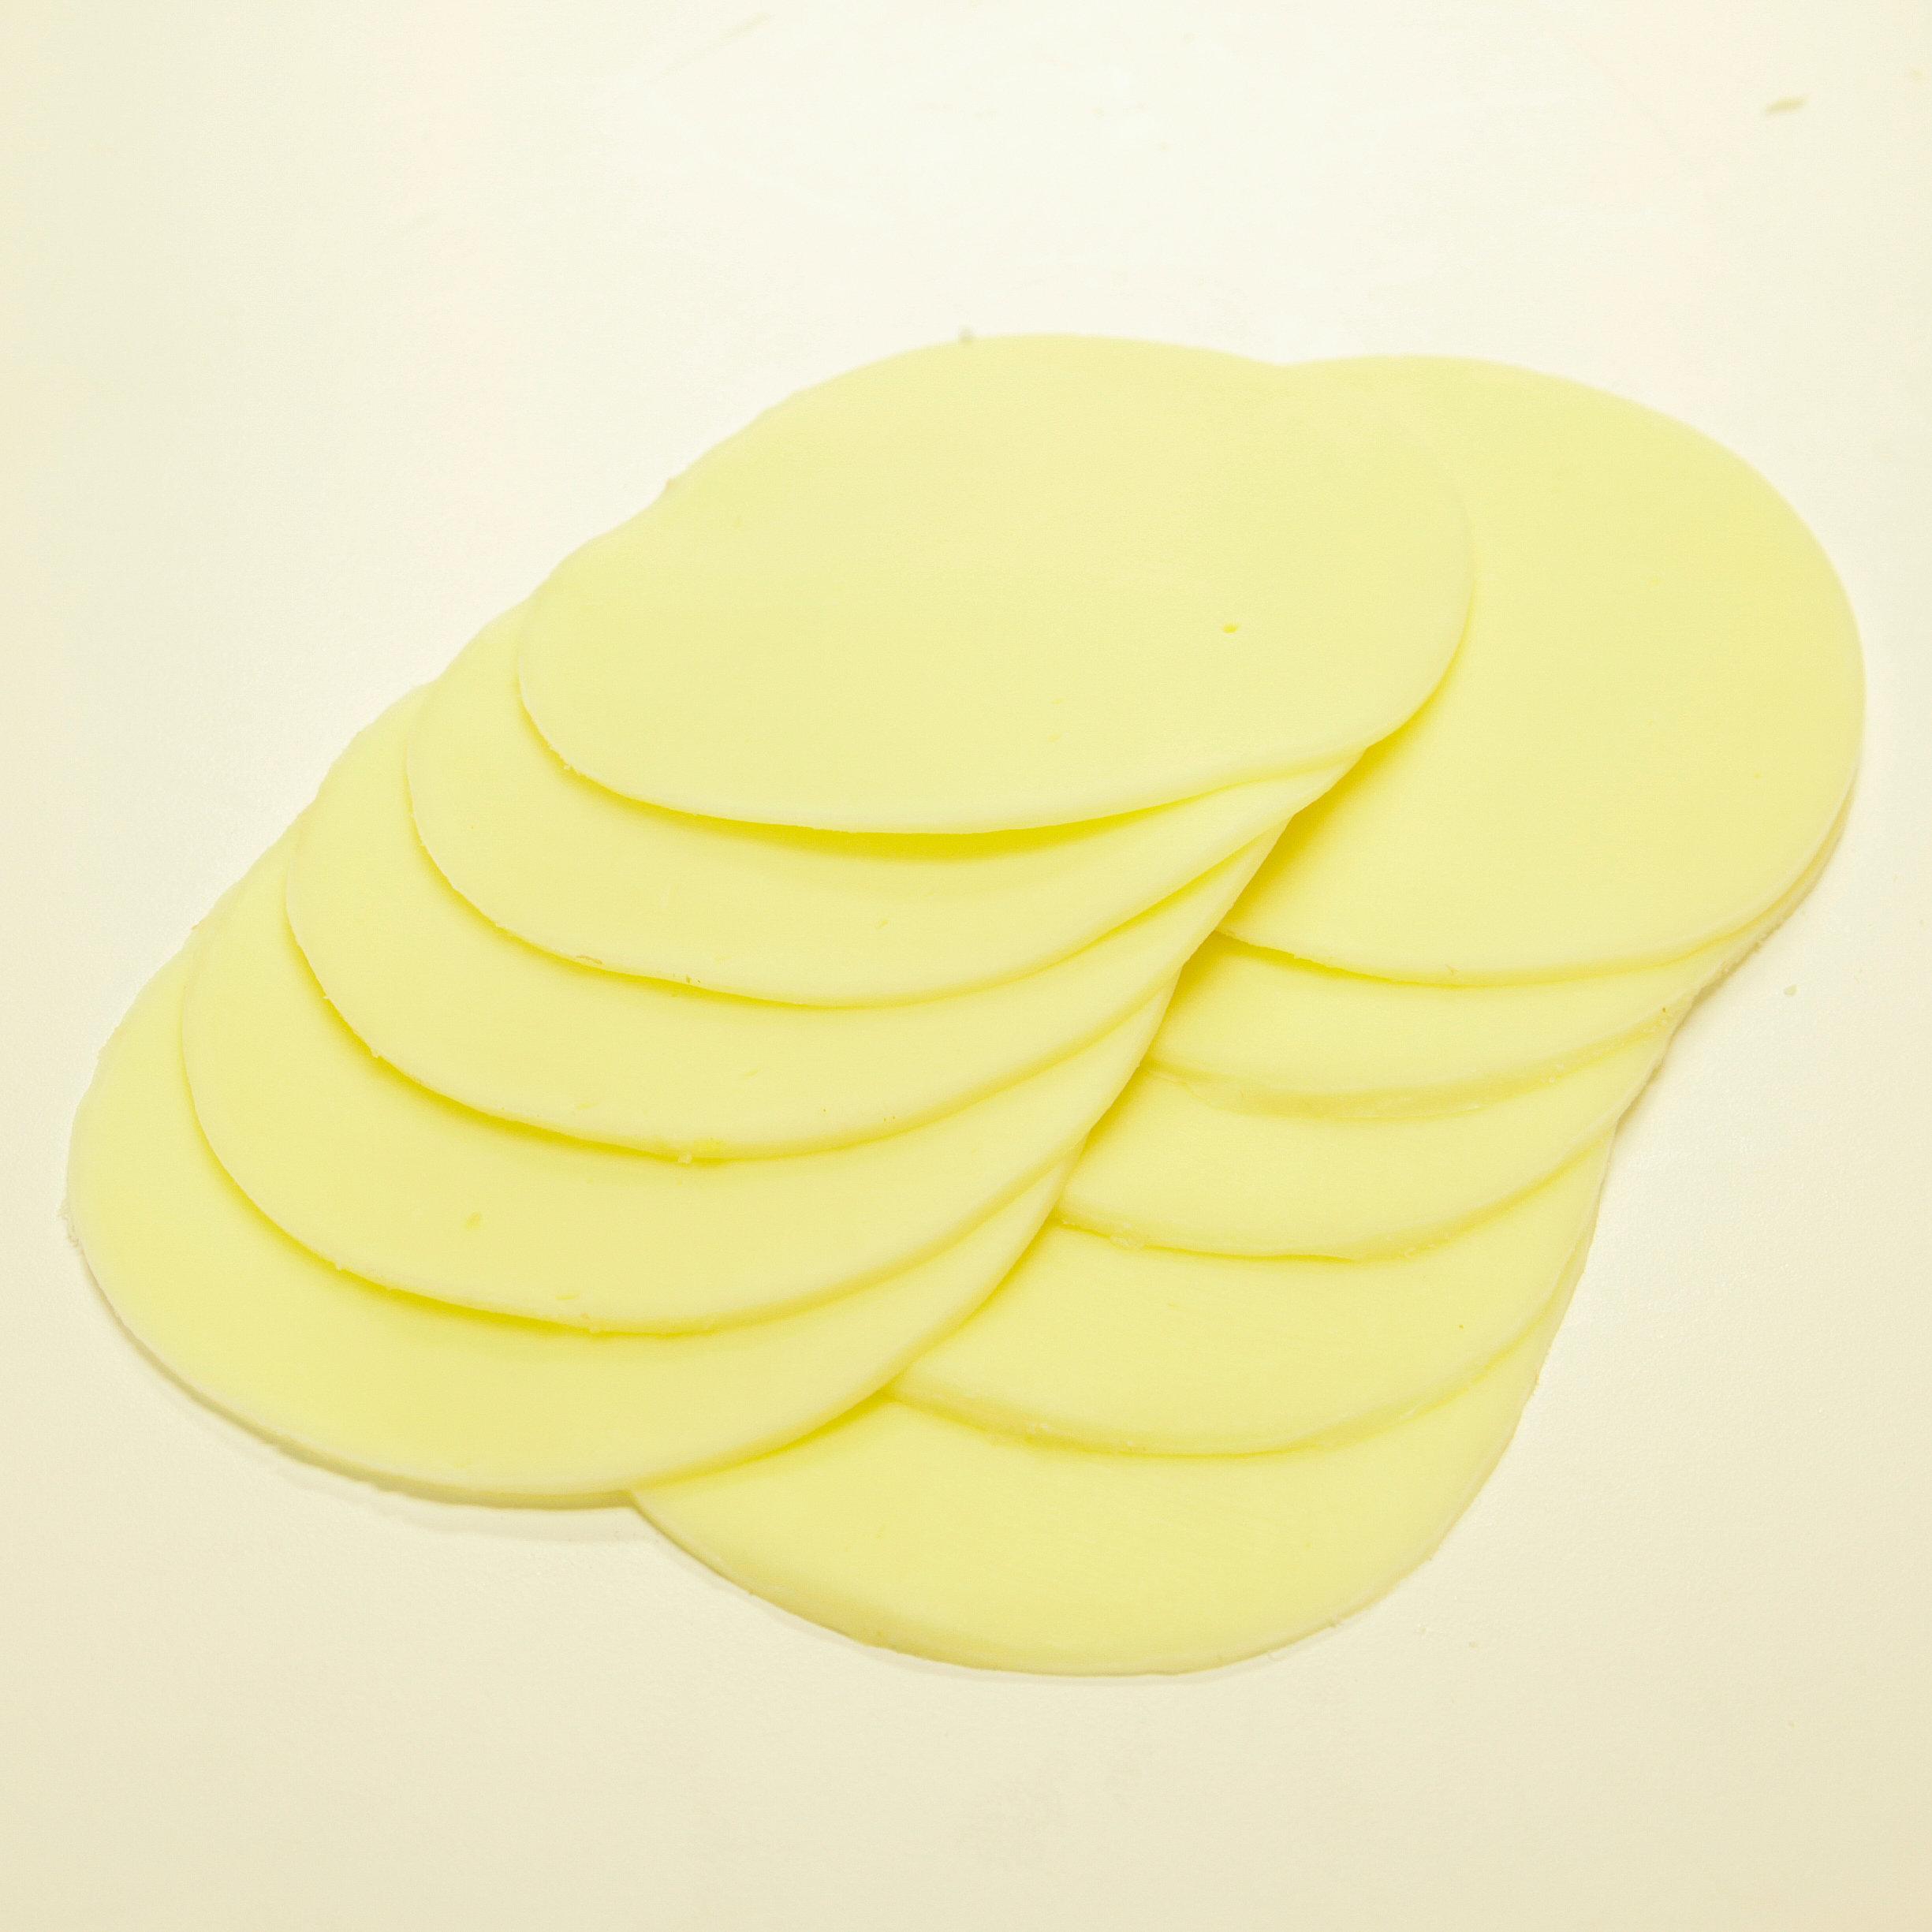 Provolone Cheese, 8 oz. 00119